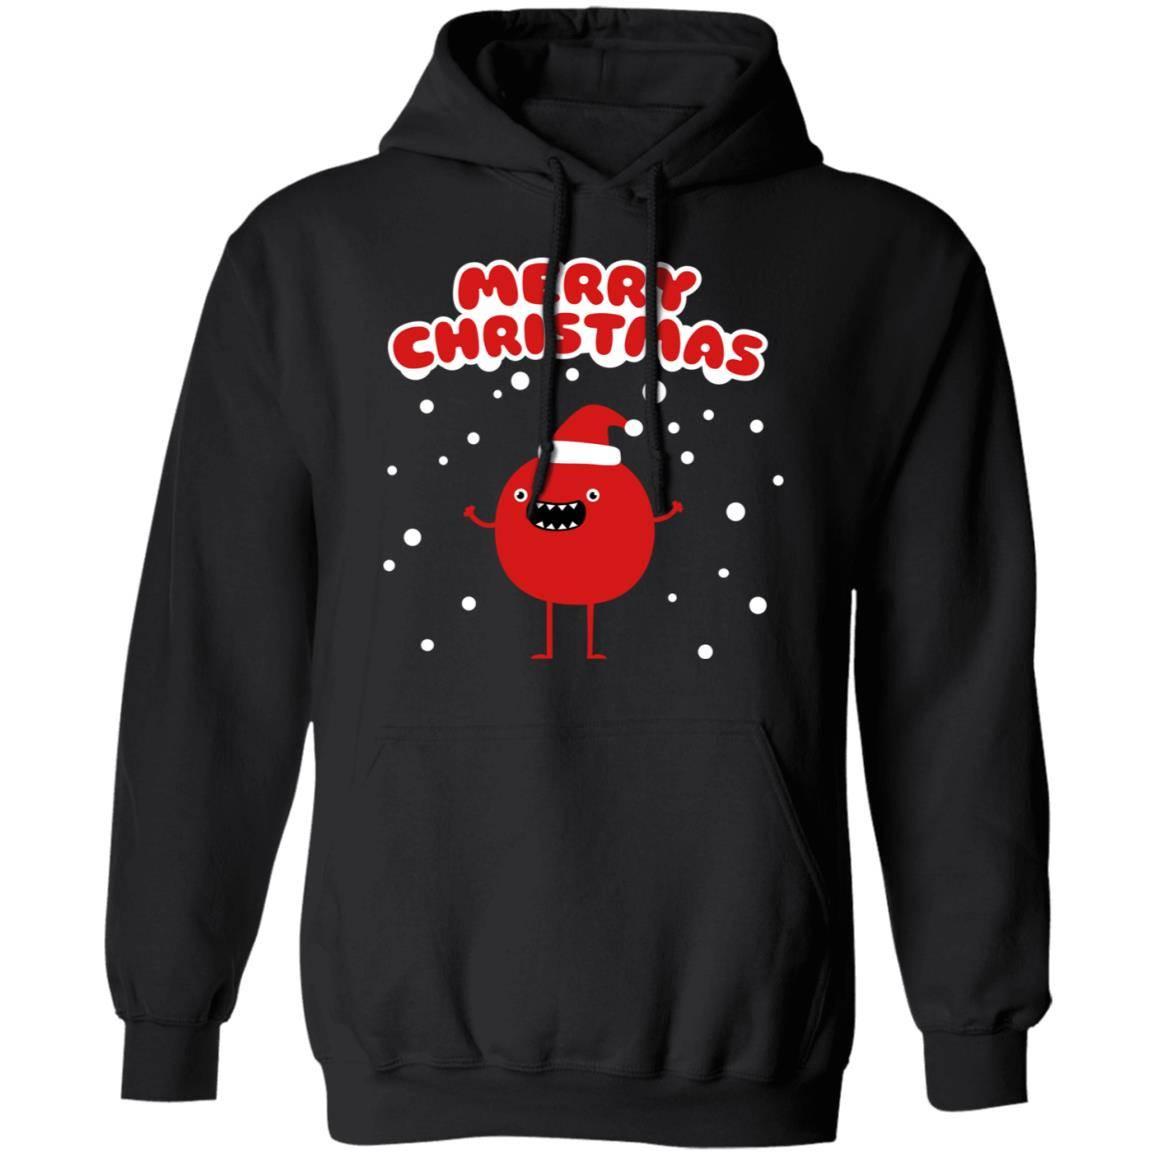 224 Funny Santa Claus – Merry Christmas – Eco-Friendly Cotton G185 Gildan Pullover Hoodie 8 oz.